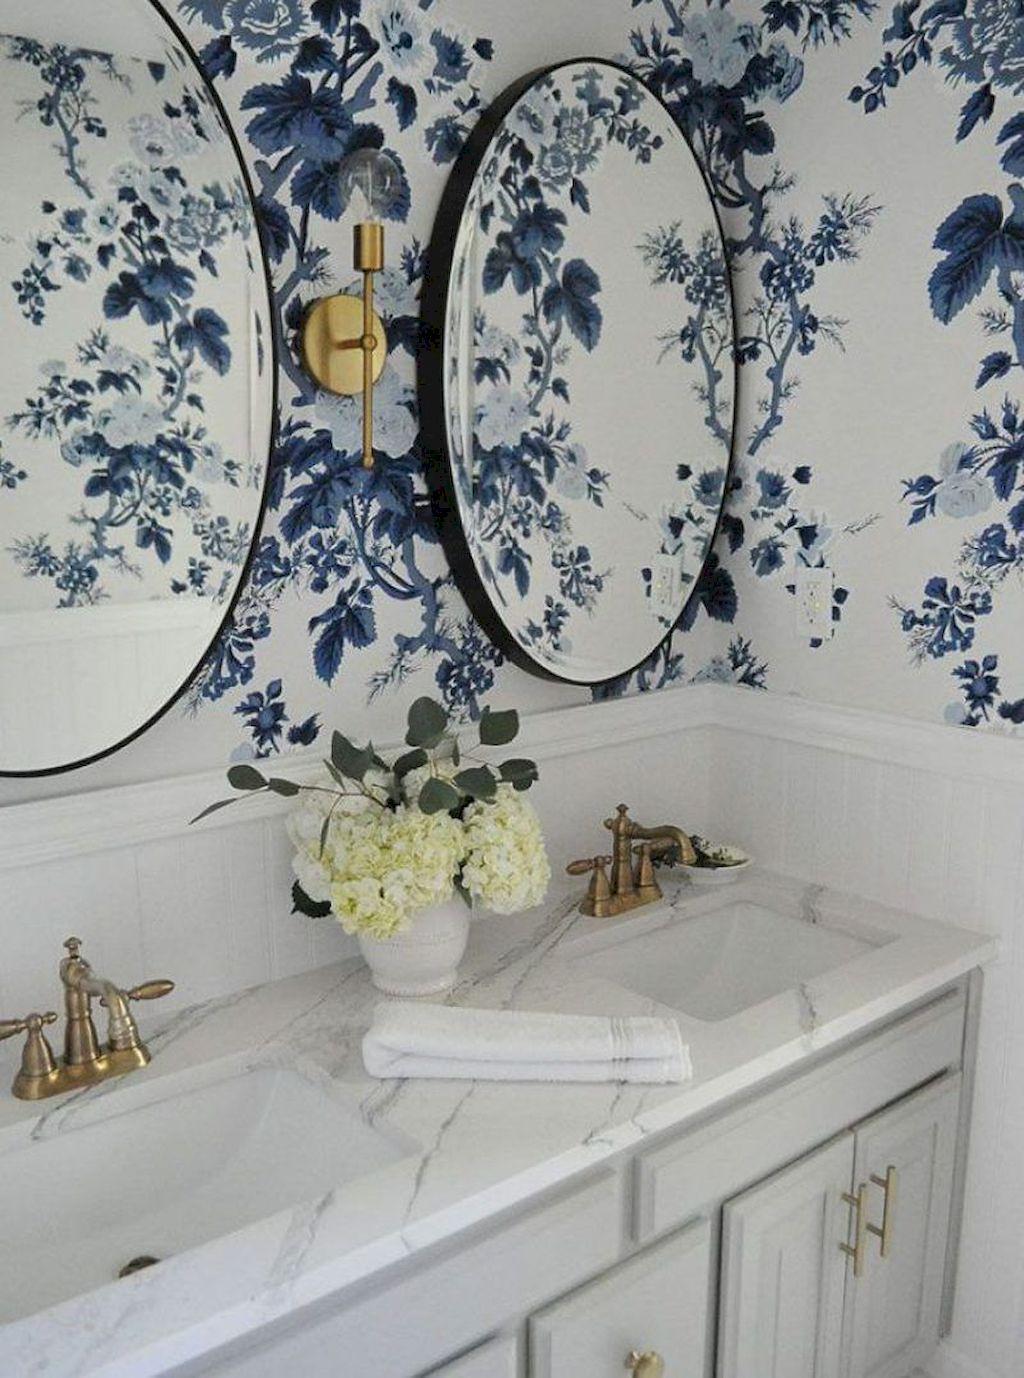 Girls Bathroom Ideas | Blue Floral Wallpaper | Blue Flower Wallpaper | Beautiful Floral Wallpapered Bathroom Inspiration